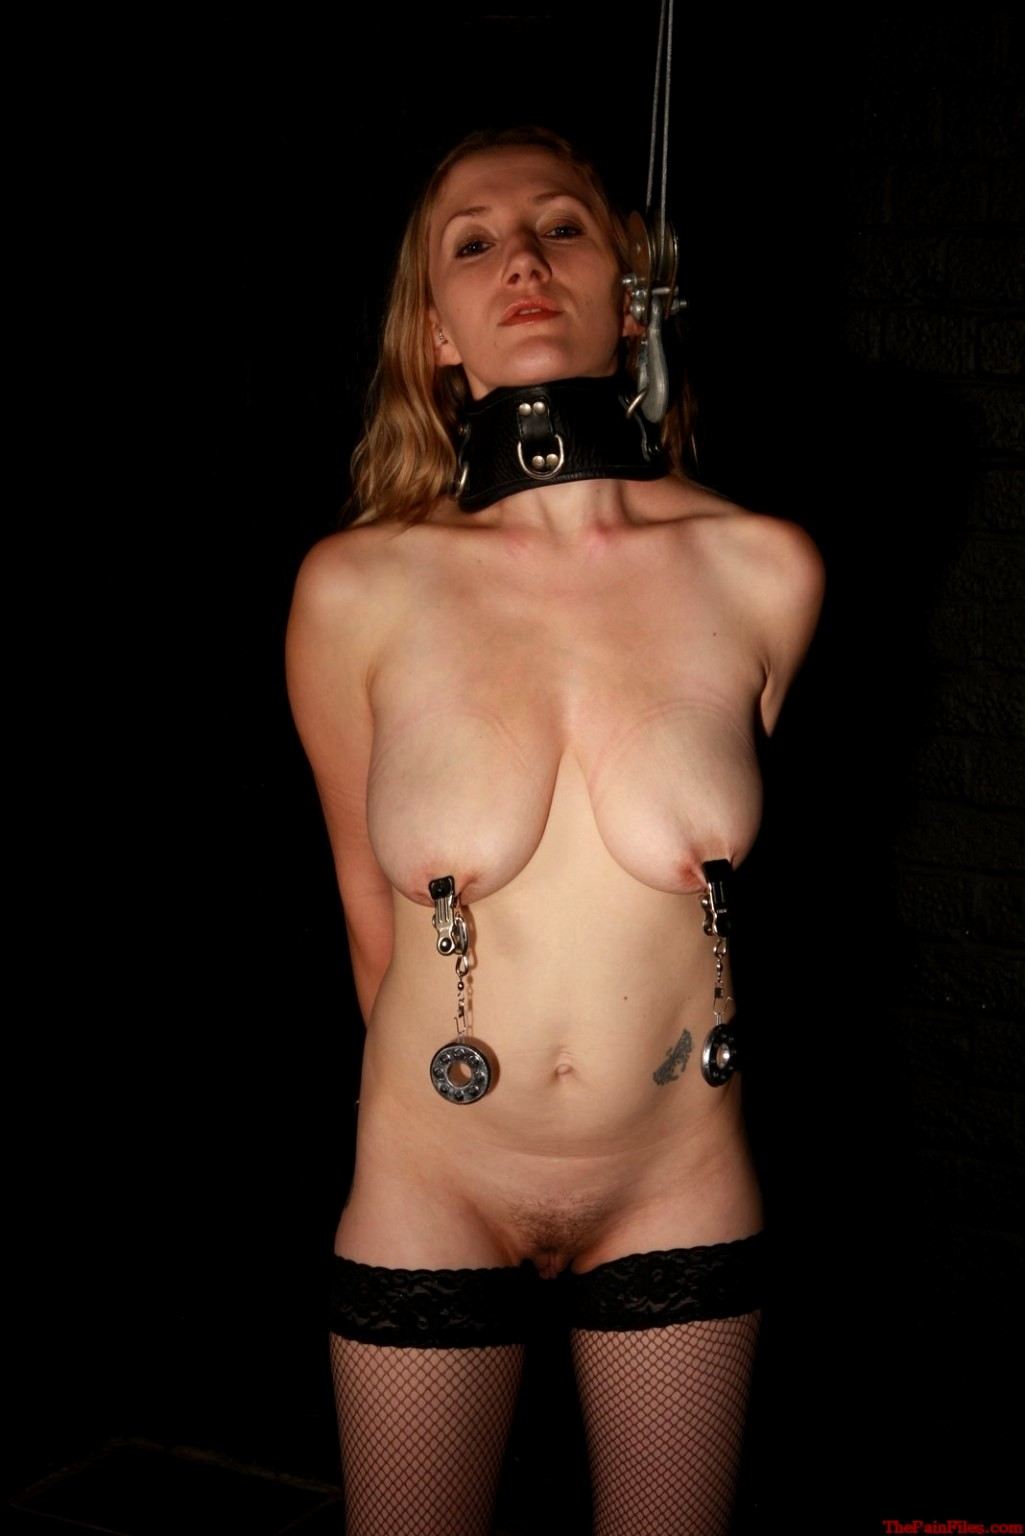 Slave women led around y pierced nipples free xxx galeries